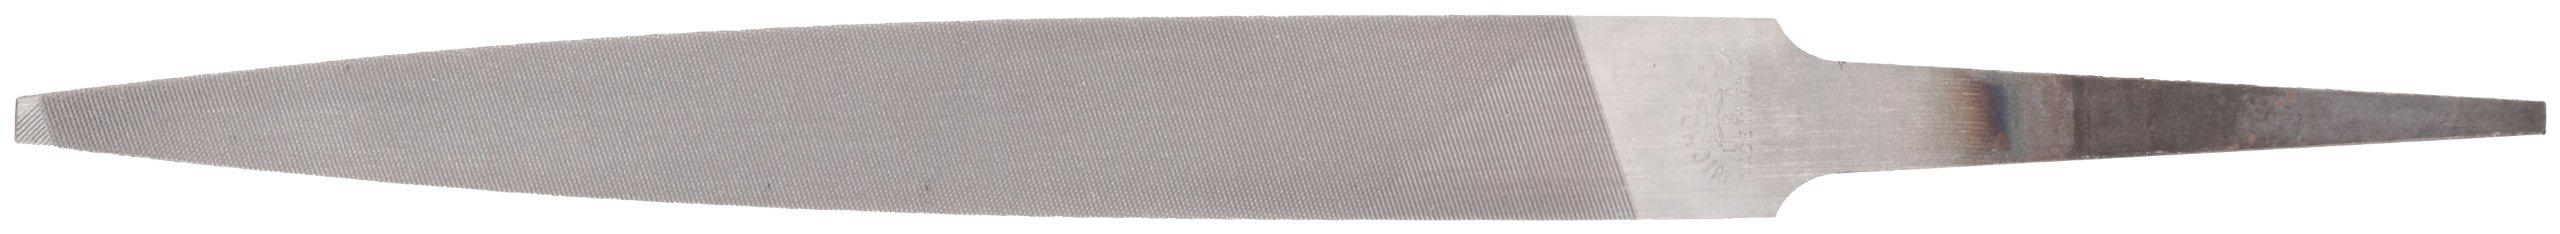 Nicholson Warding Hand File, American Pattern, Double Cut, Rectangular, Coarse, 10'' Length